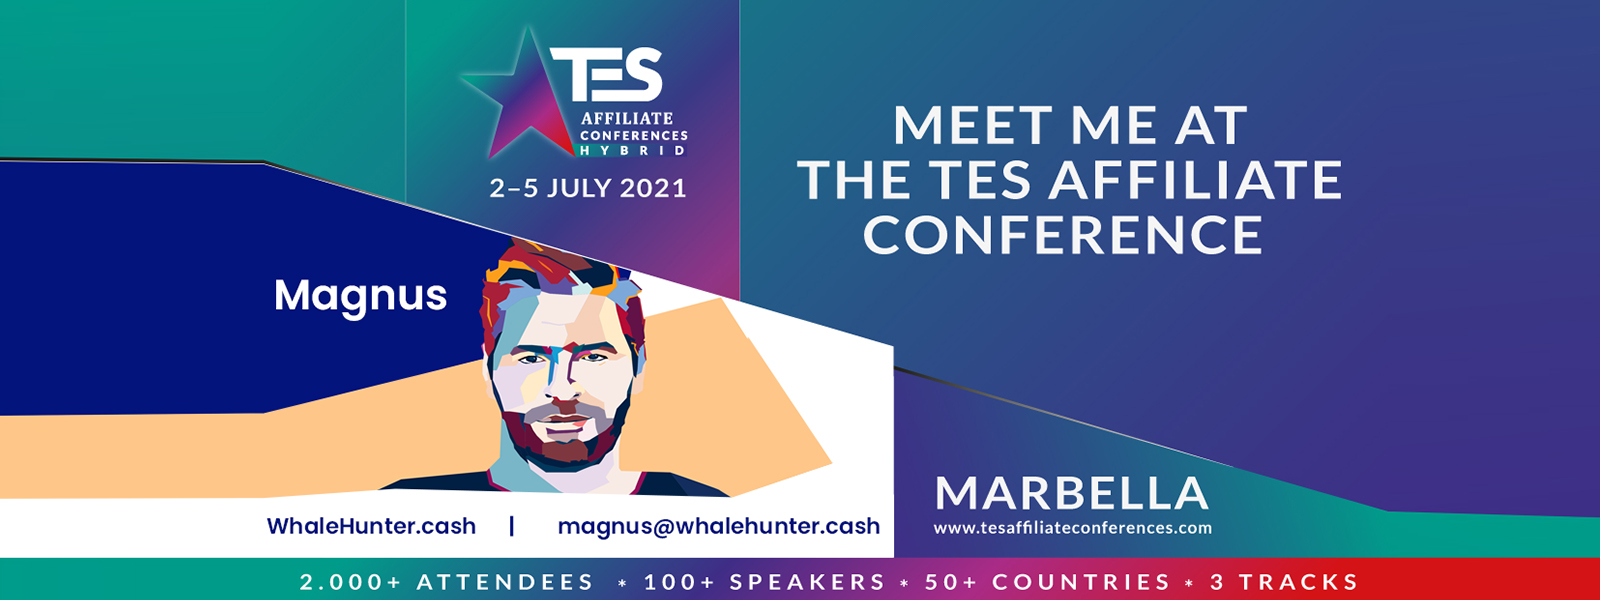 Meet WhaleHunter.cash at the TES Affiliate Conferences!